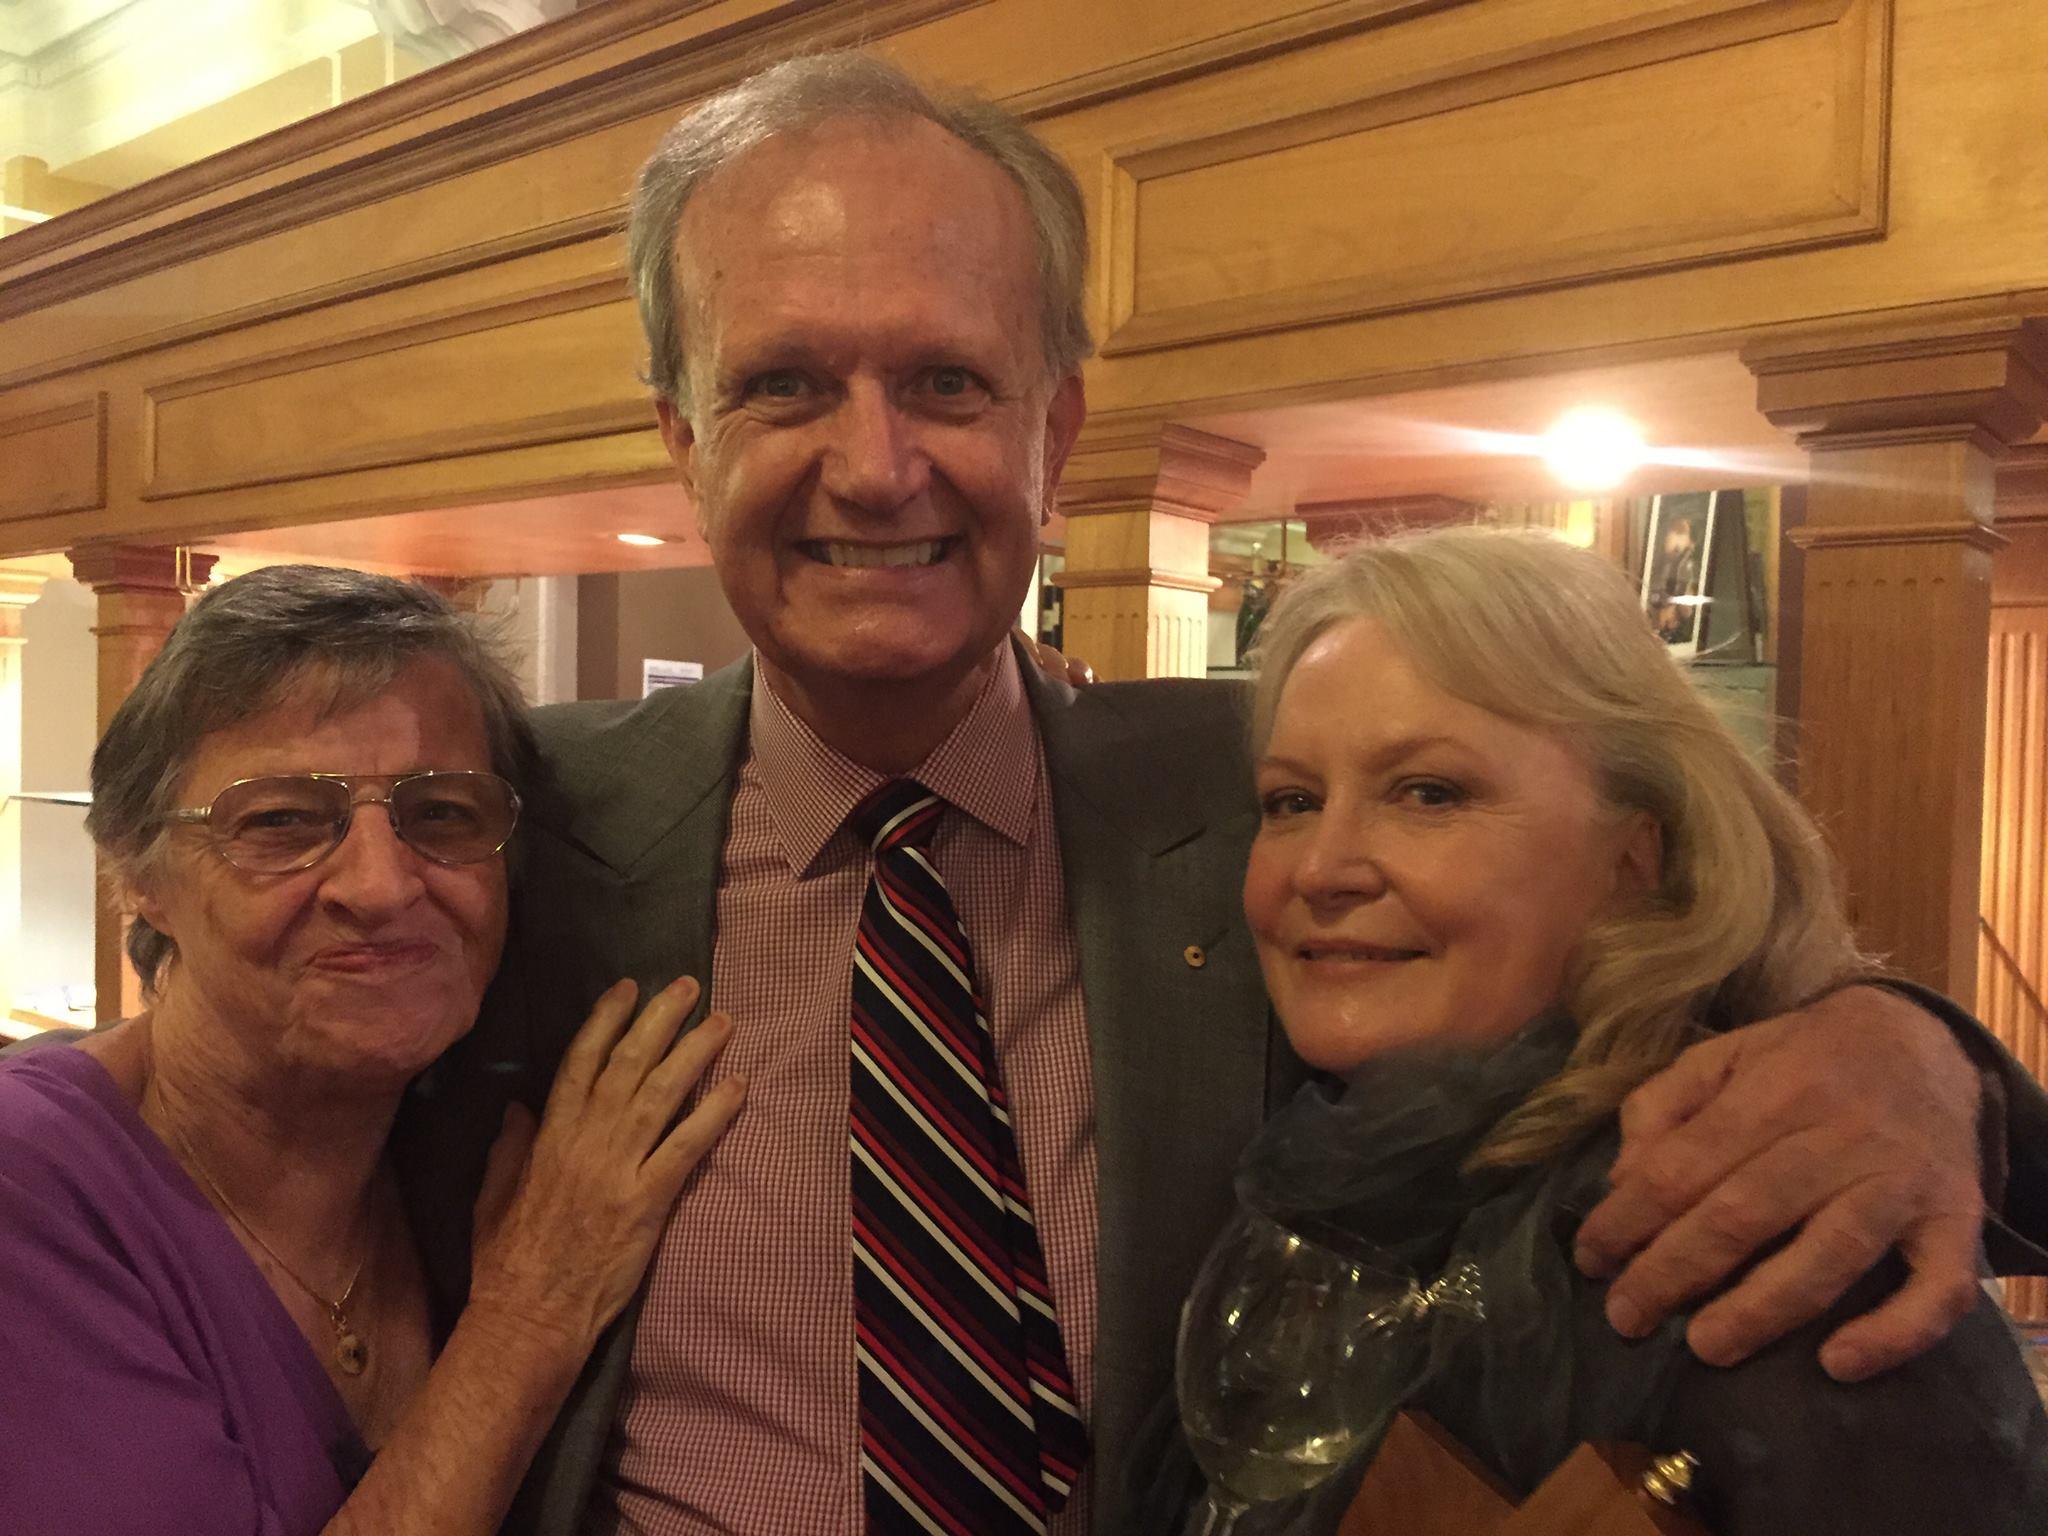 Alberta Mayne,Shanice Jordyn XXX pic Liz Heaston,Michael Palin (born 1943)